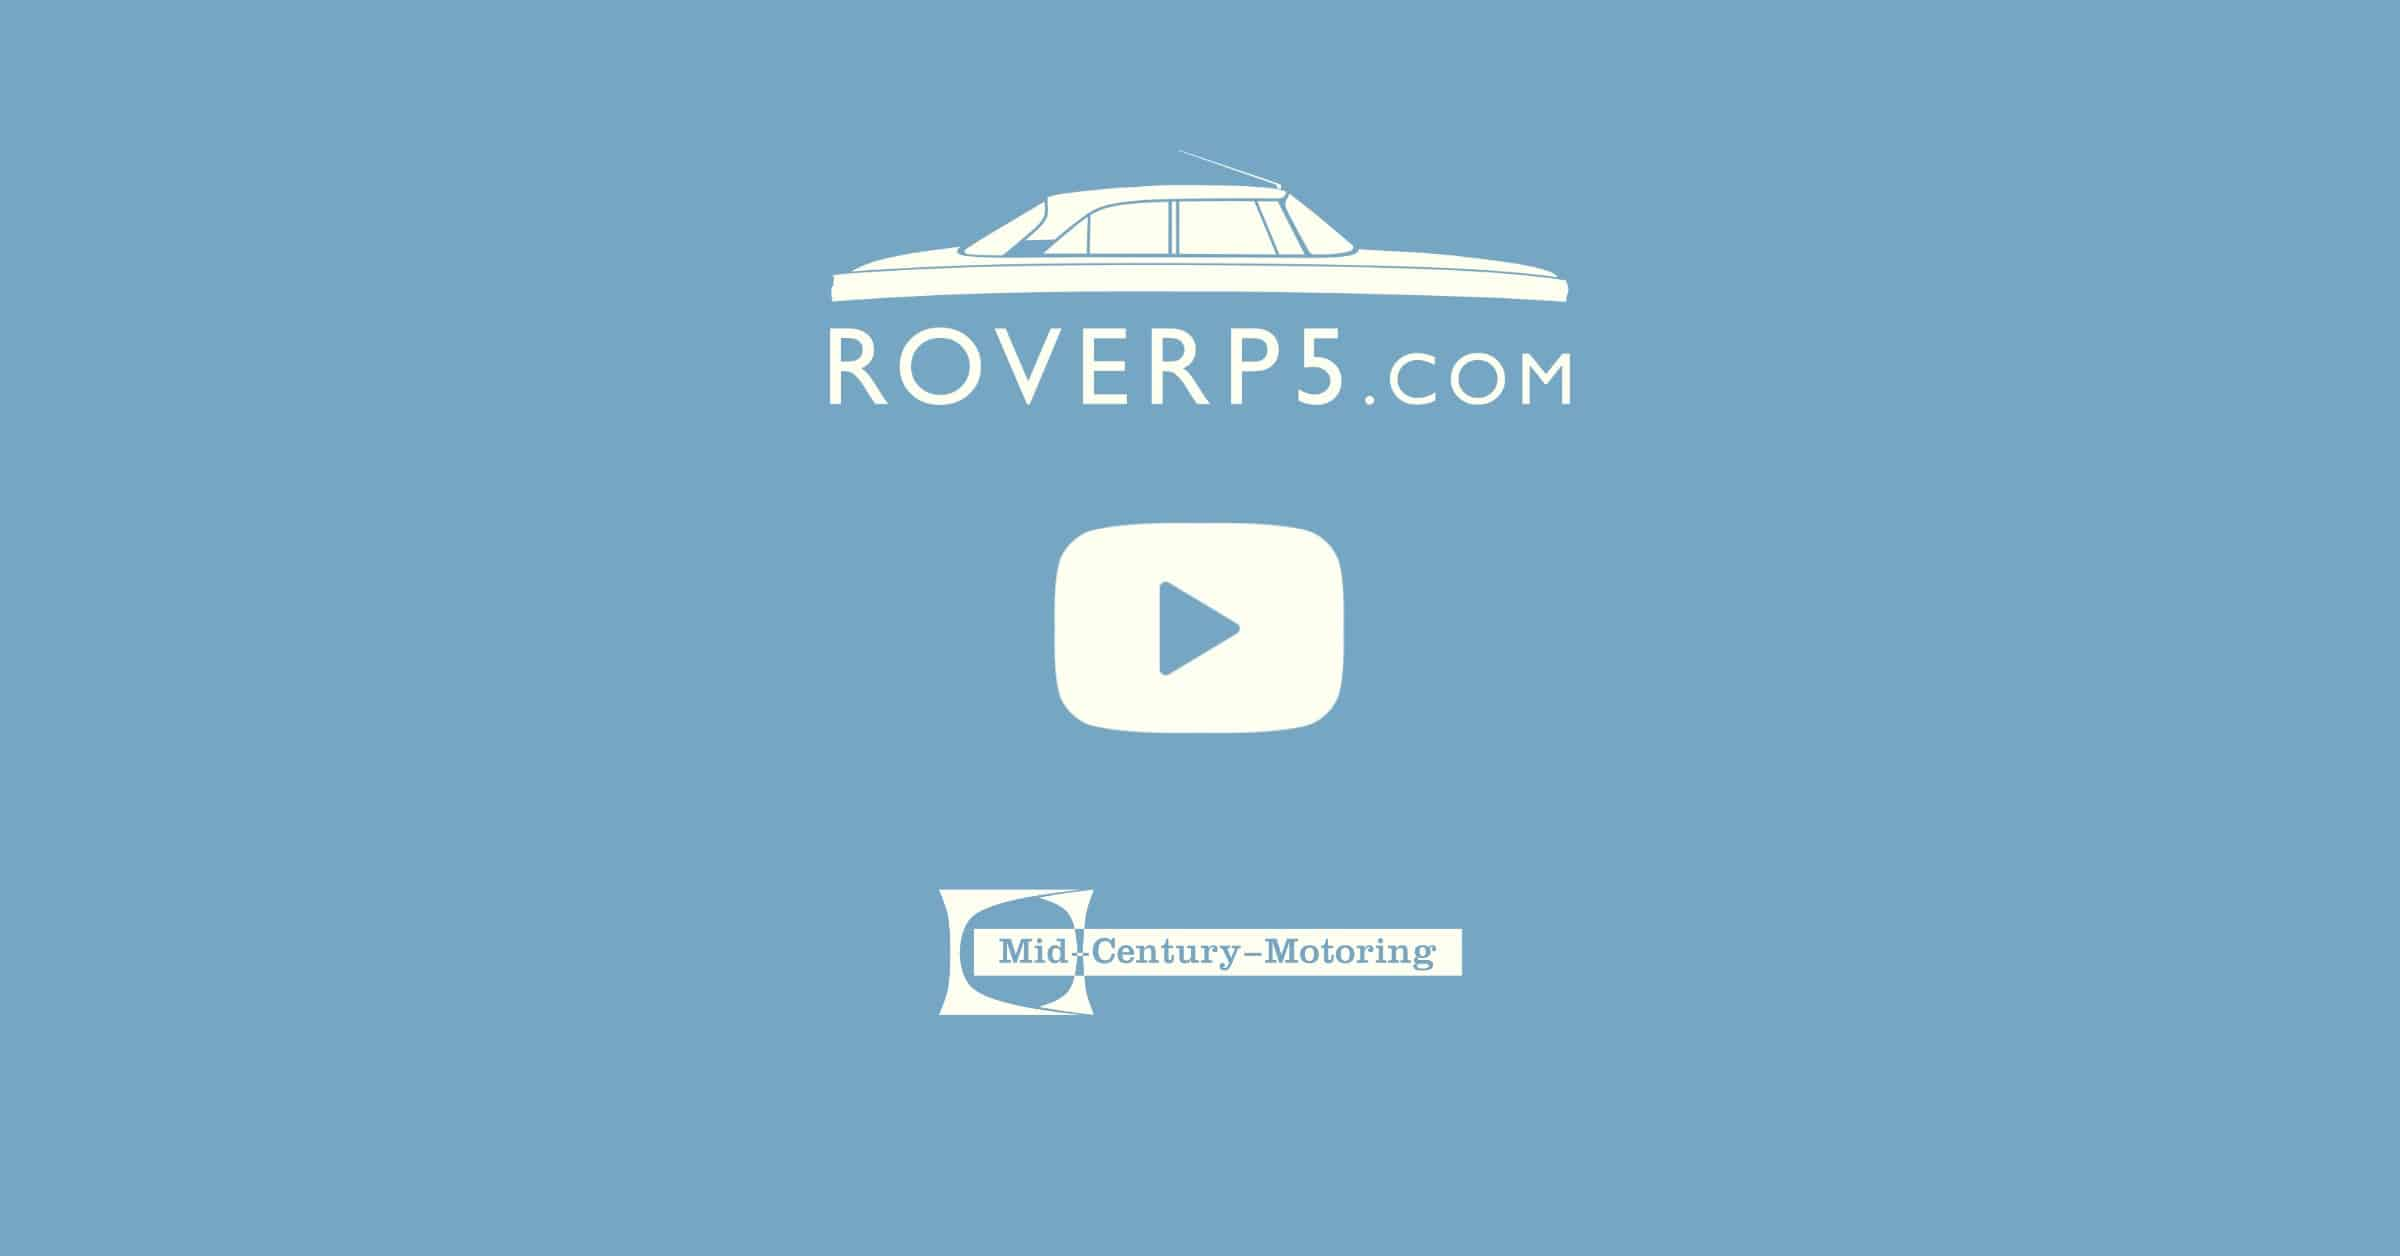 RoverP5.com Video: Quick Update and First Start